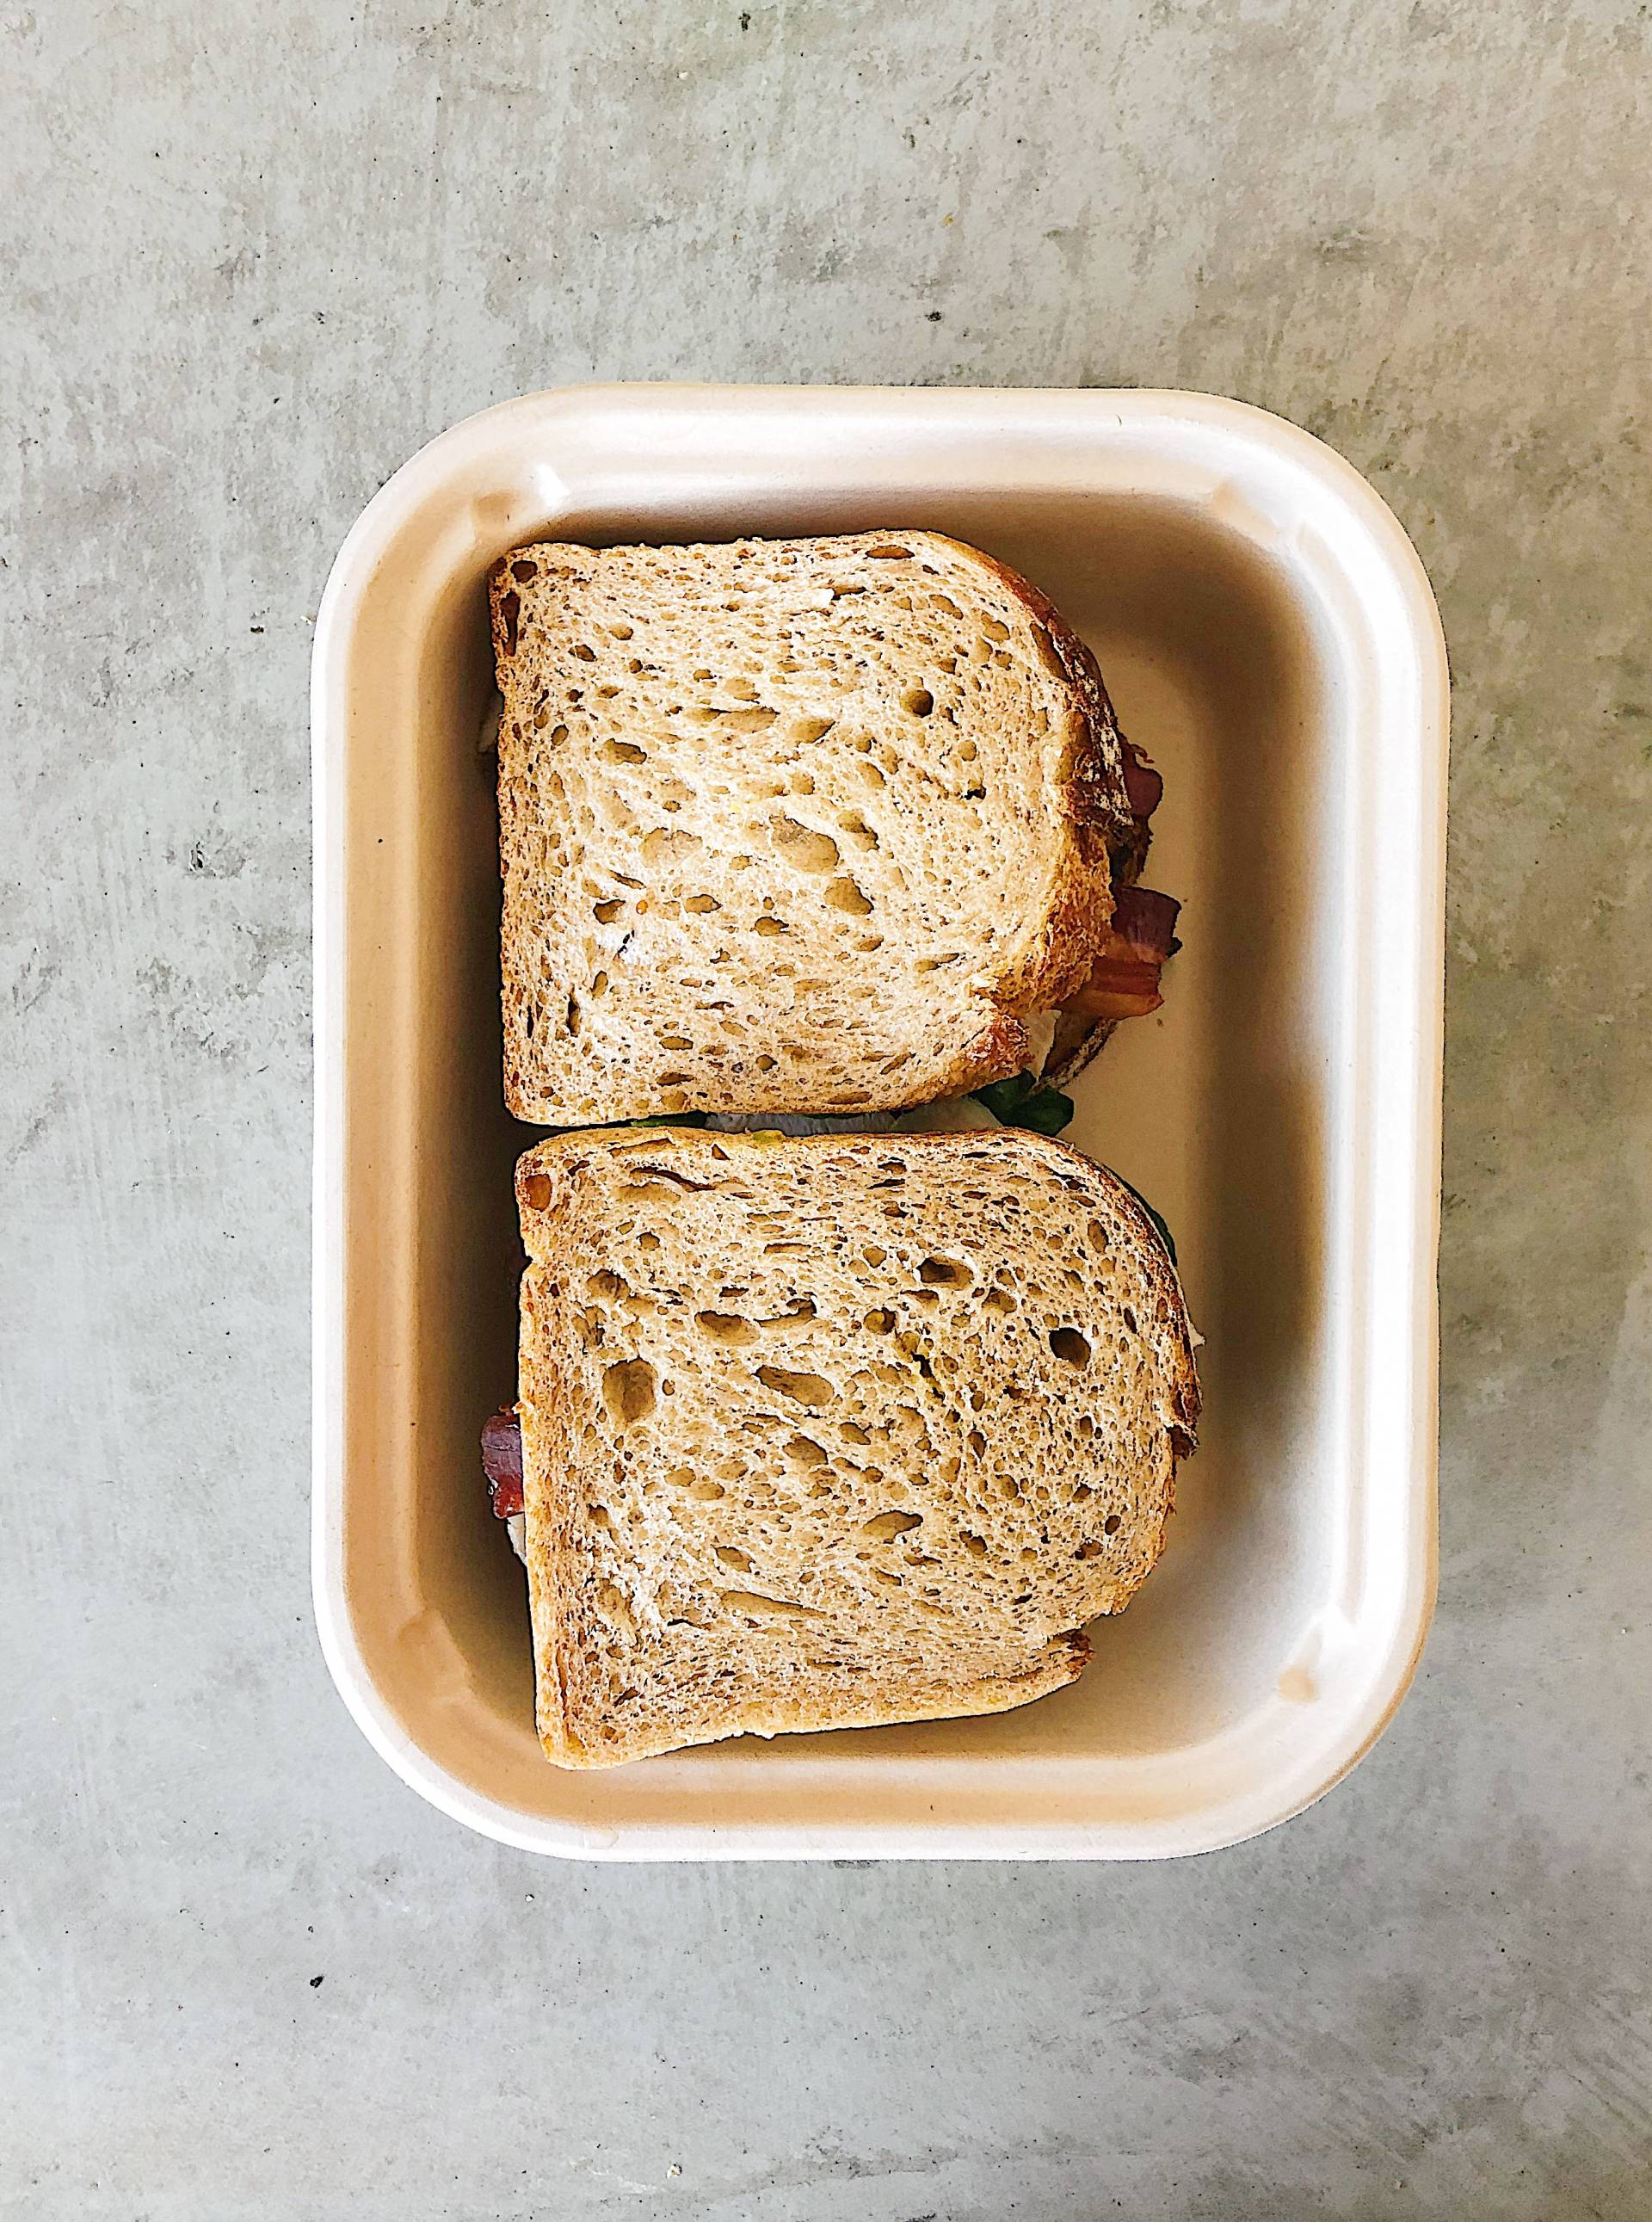 Smoked Pastrami Sandwich, kale slaw, swiss cheese, thousand island